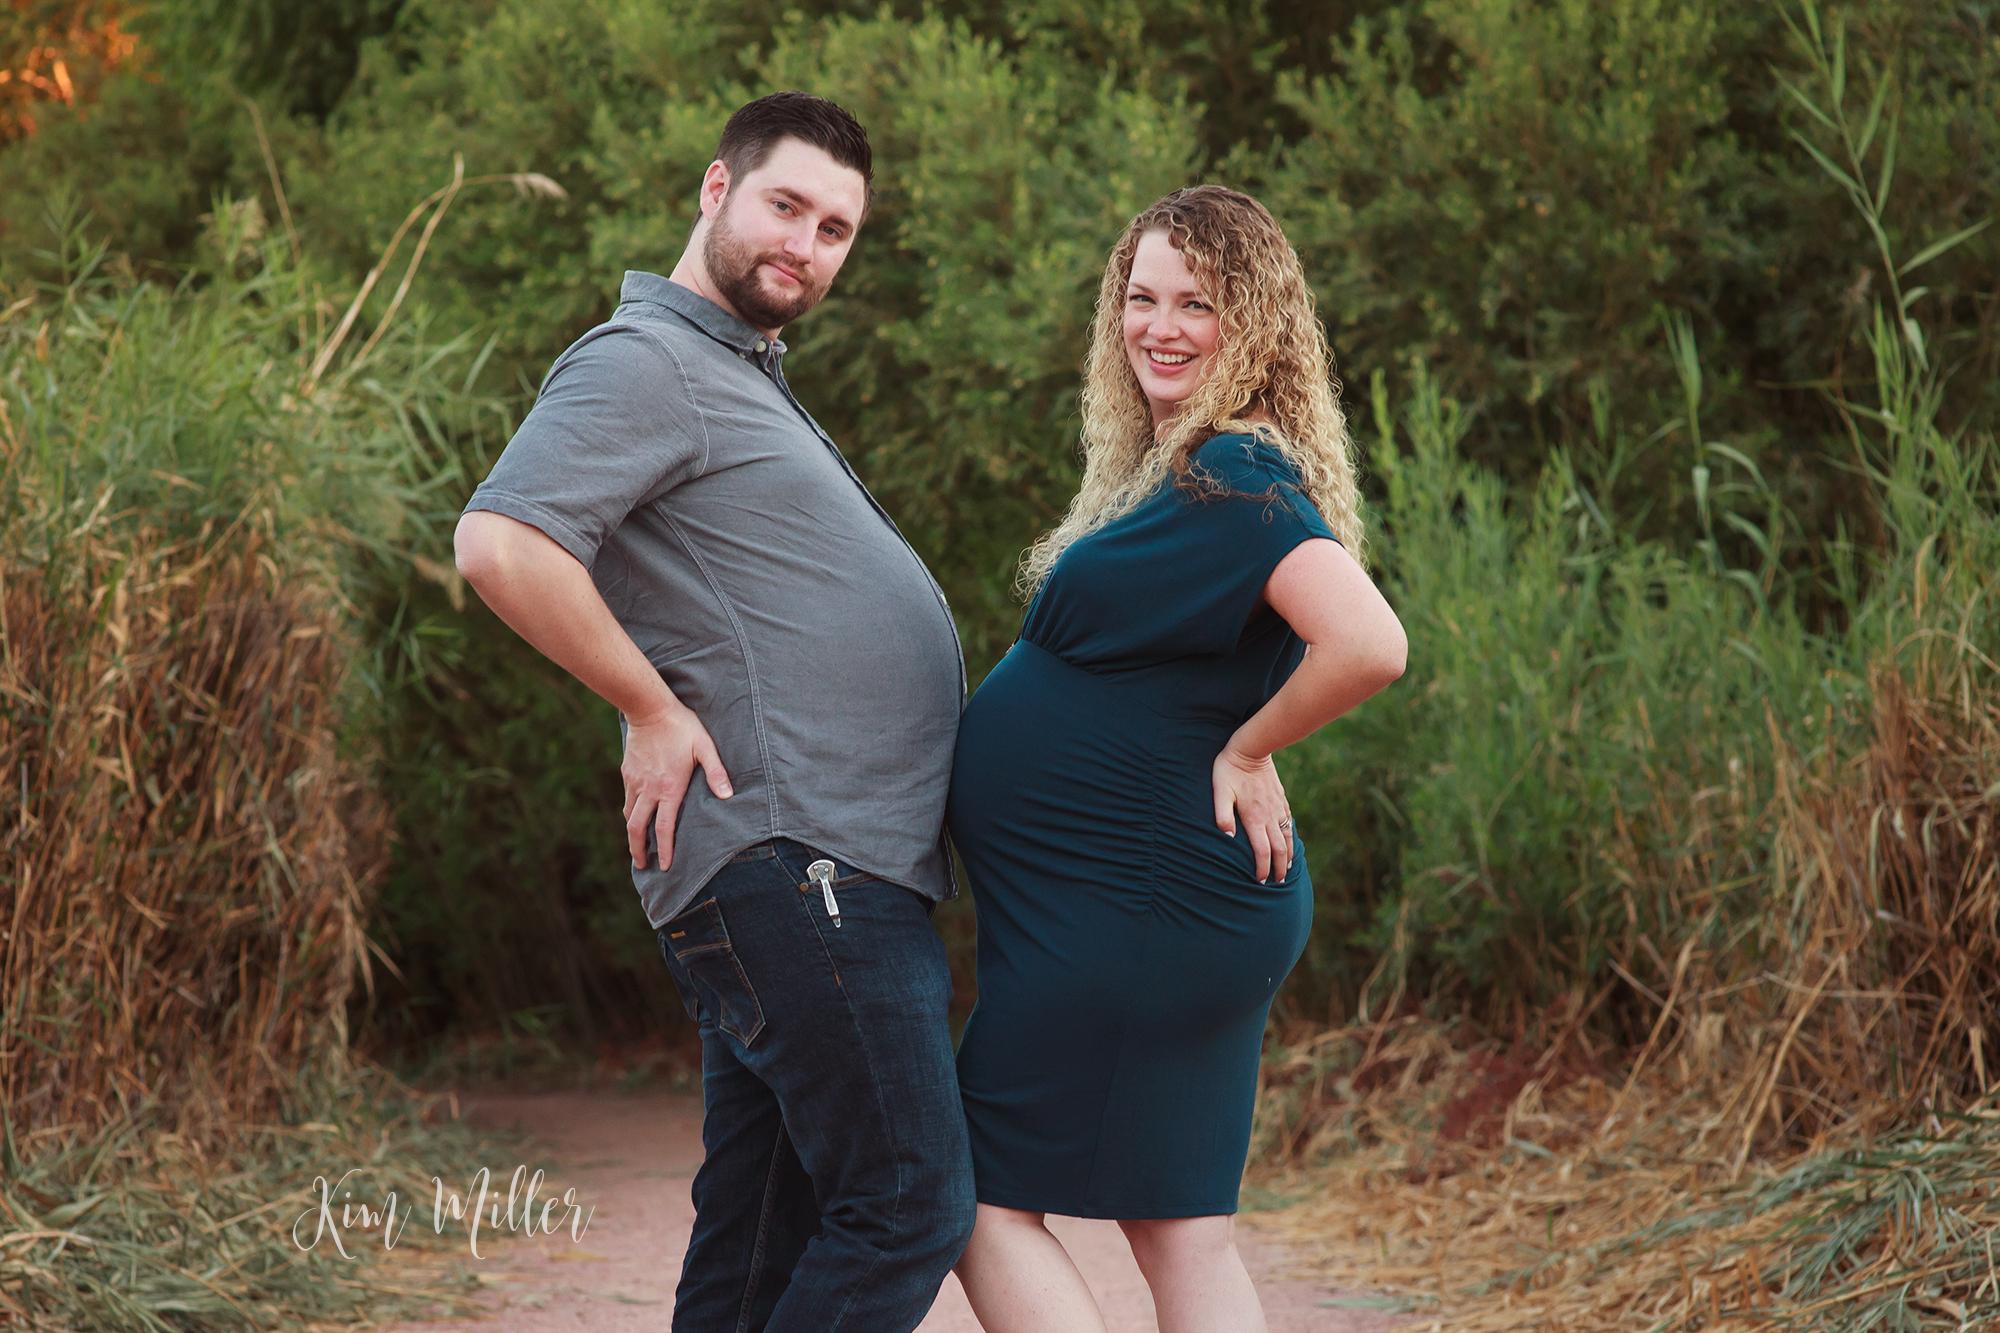 Wetlands Park Maternity Photography, Las Vegas Photographer, Maternity Portraits